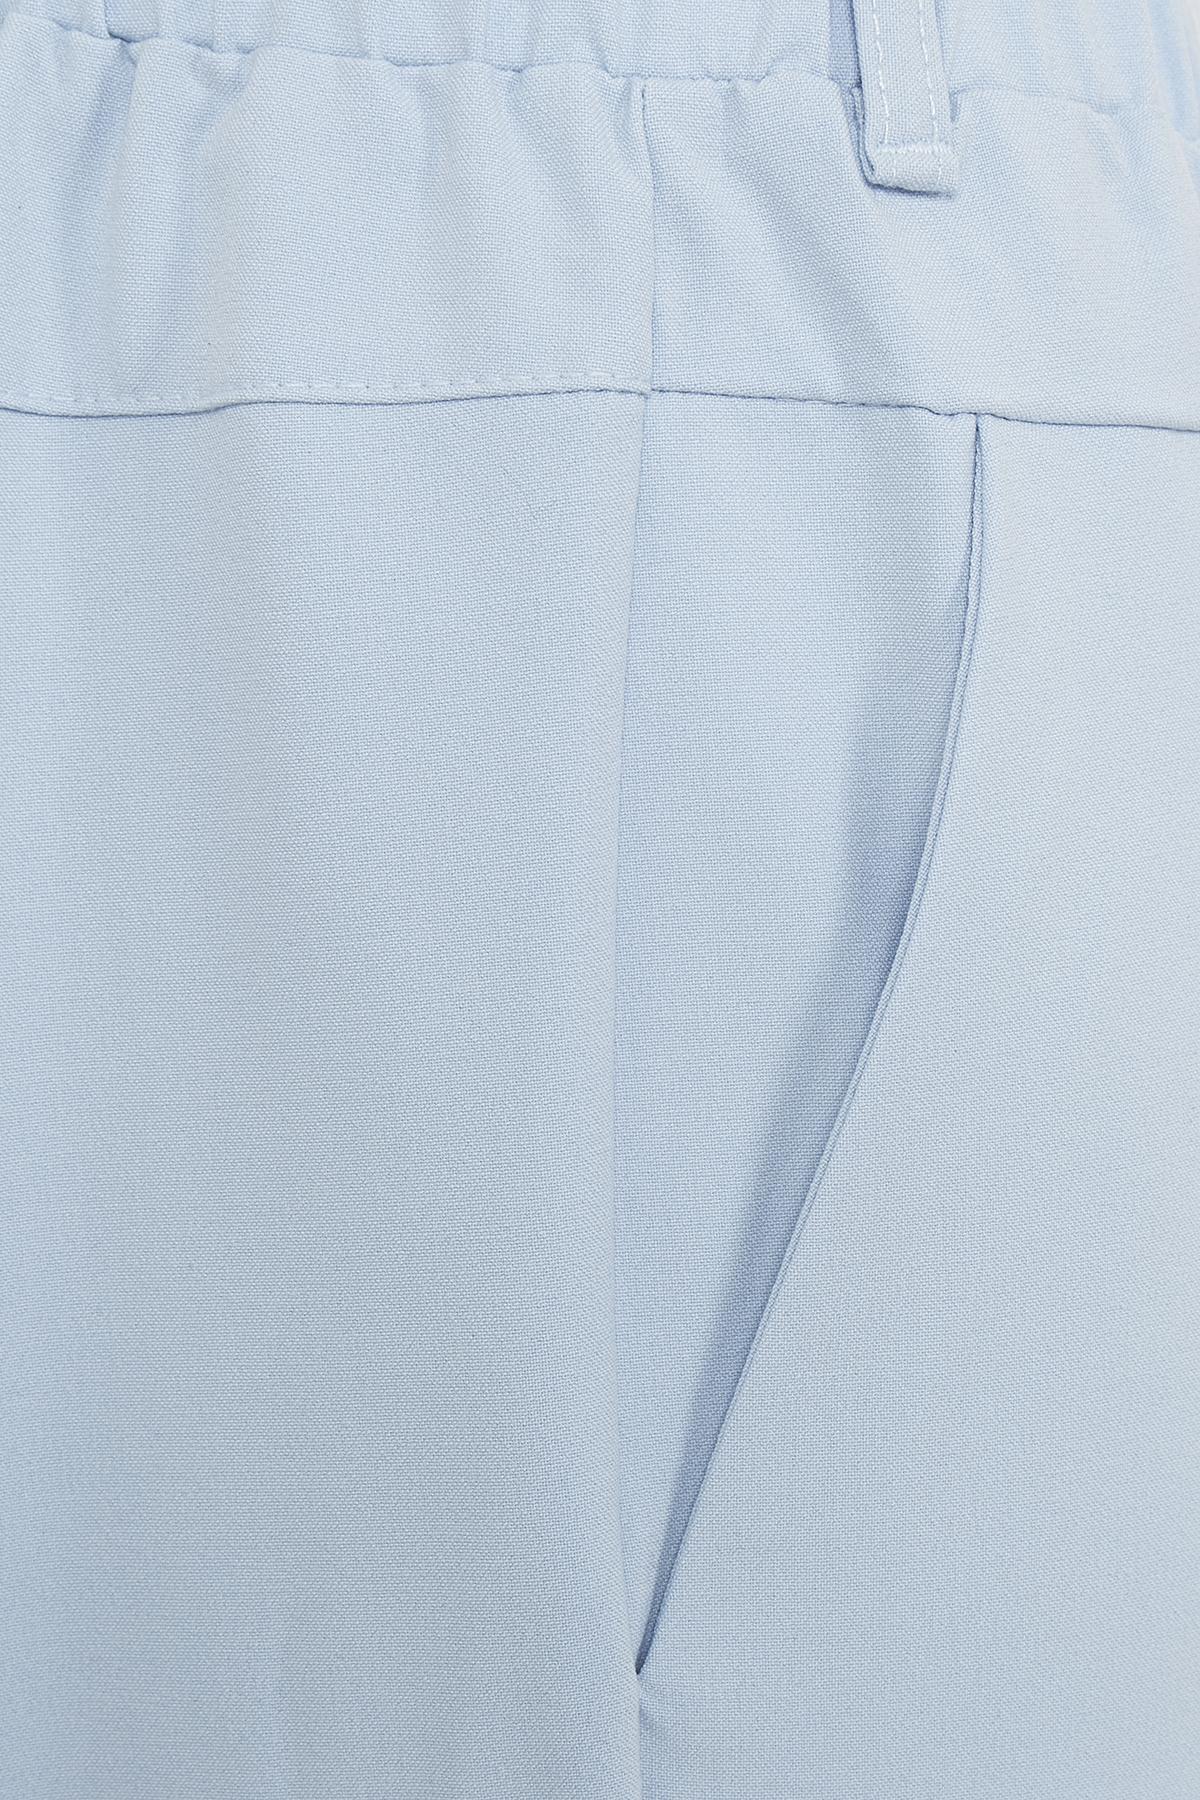 Blau Hose von Kaffe – Shoppen SieBlau Hose ab Gr. 32-46 hier